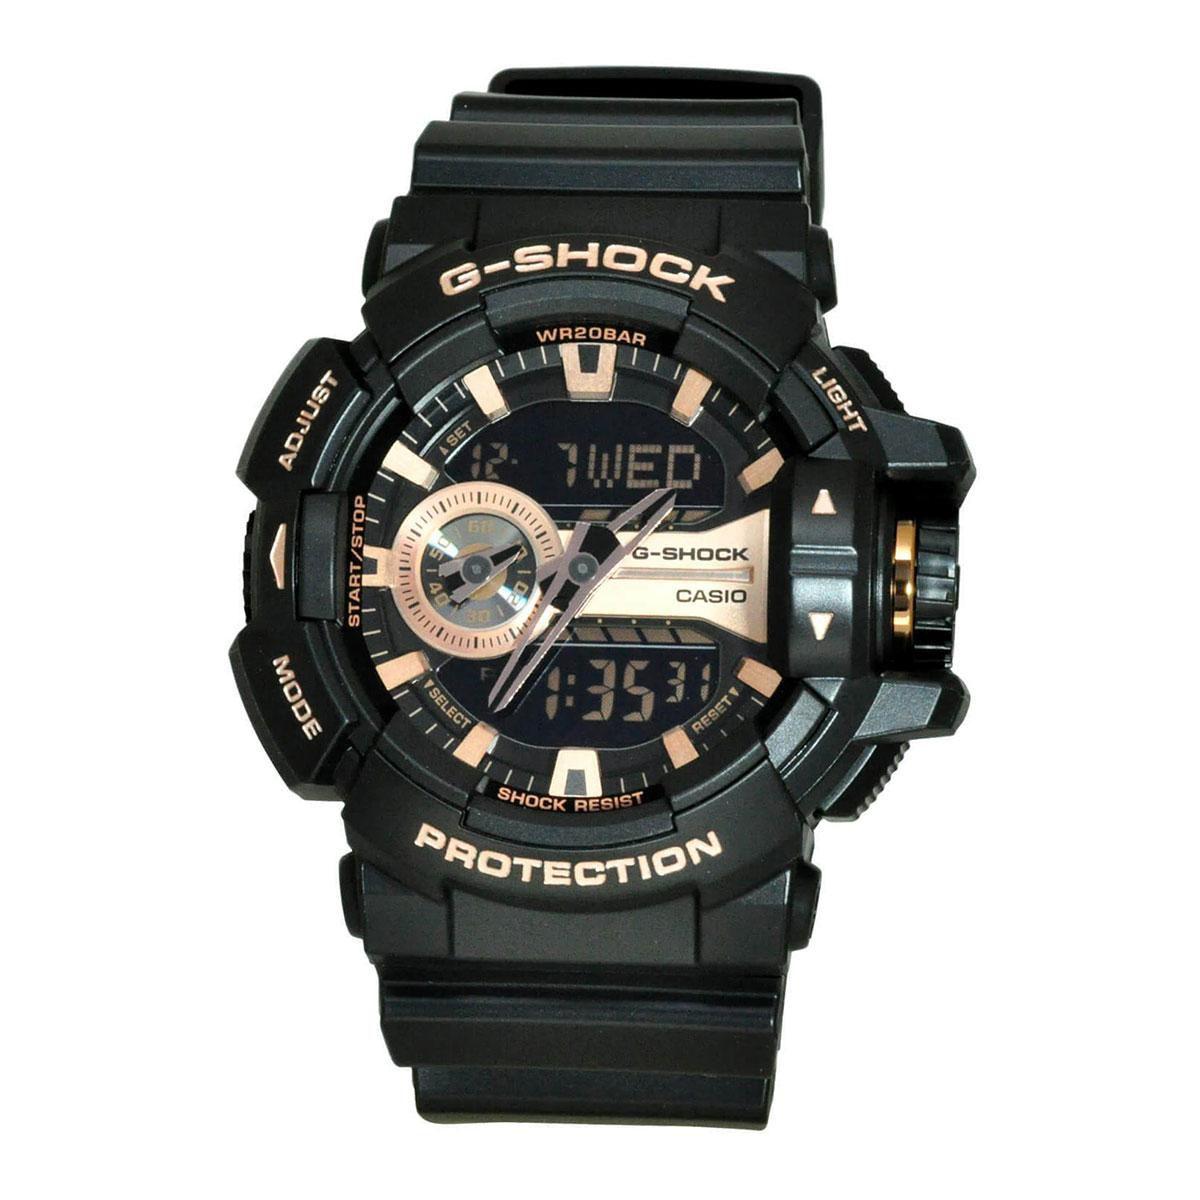 Relógio Masculino G-Shock GA-400GB-1A4DR Pulseira Preta